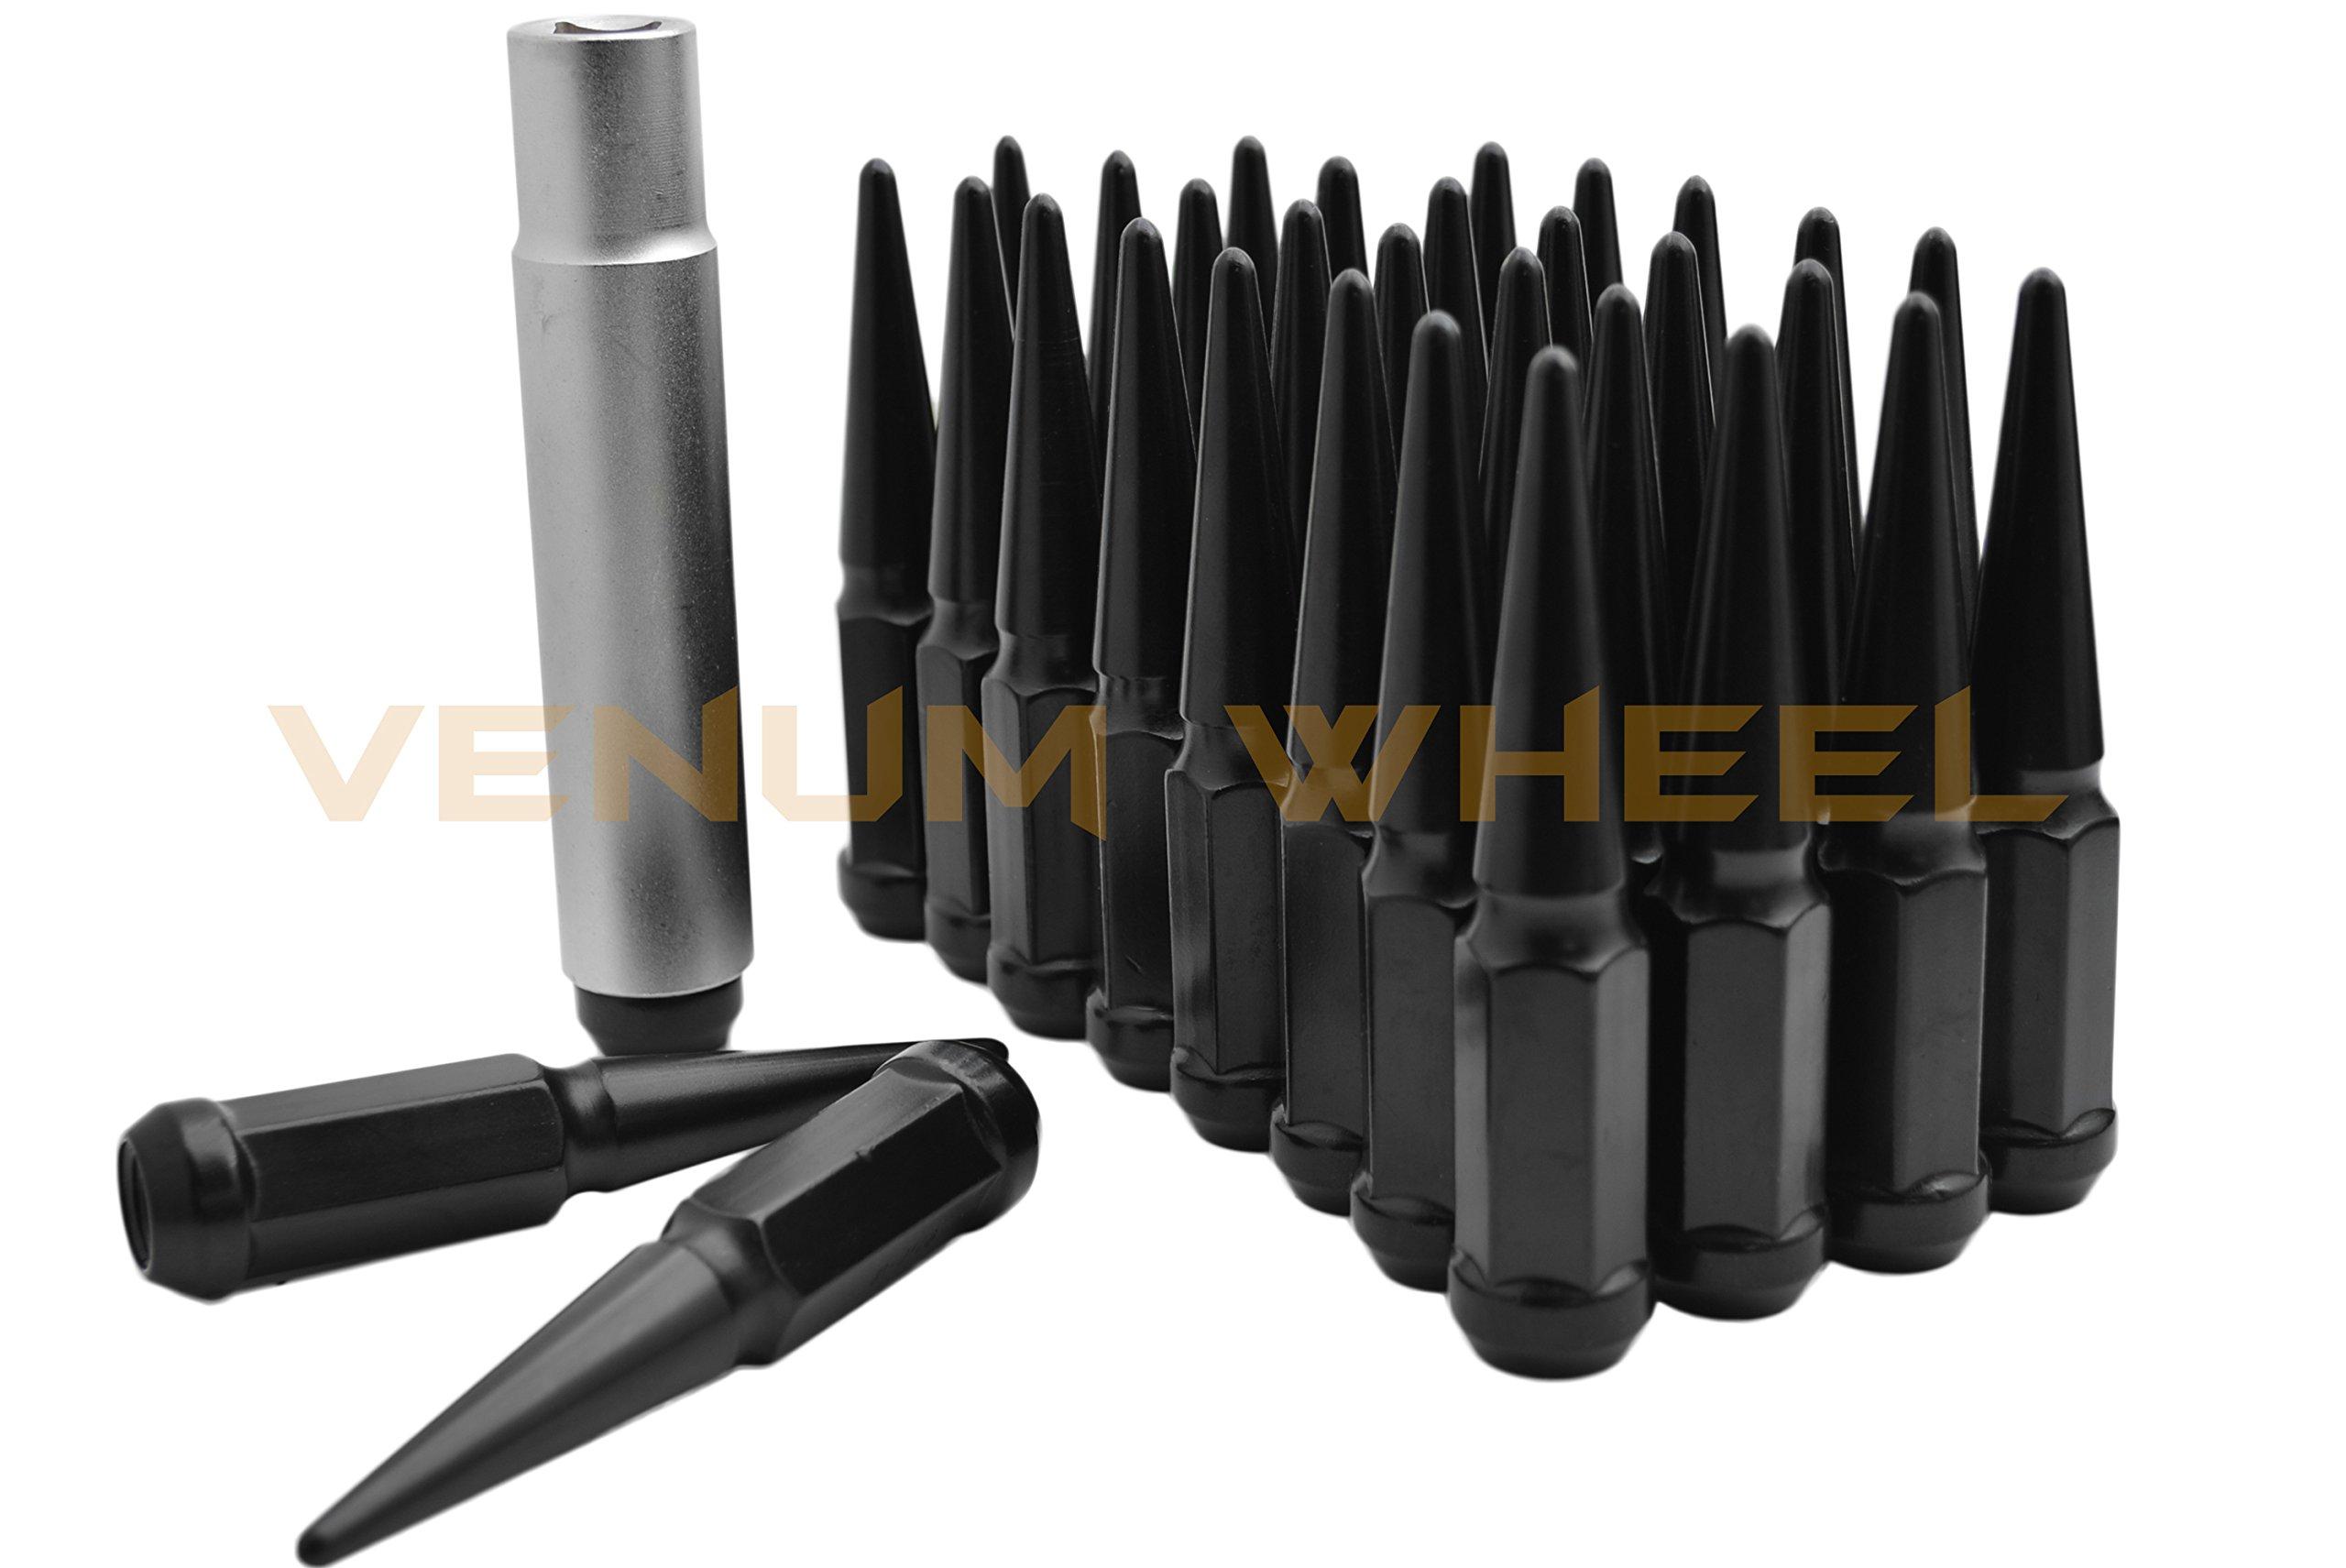 24 Pc Chevy Silverado GMC Sierra 1500 Black Spike Lug Nuts 14x1.5 Spiked Metal Lug Nuts Solid 1 Piece 4.5'' Tall Acorn Lug Nut + 1 Special Design Key - Aftermarket Wheels Heavy Duty Made in USA